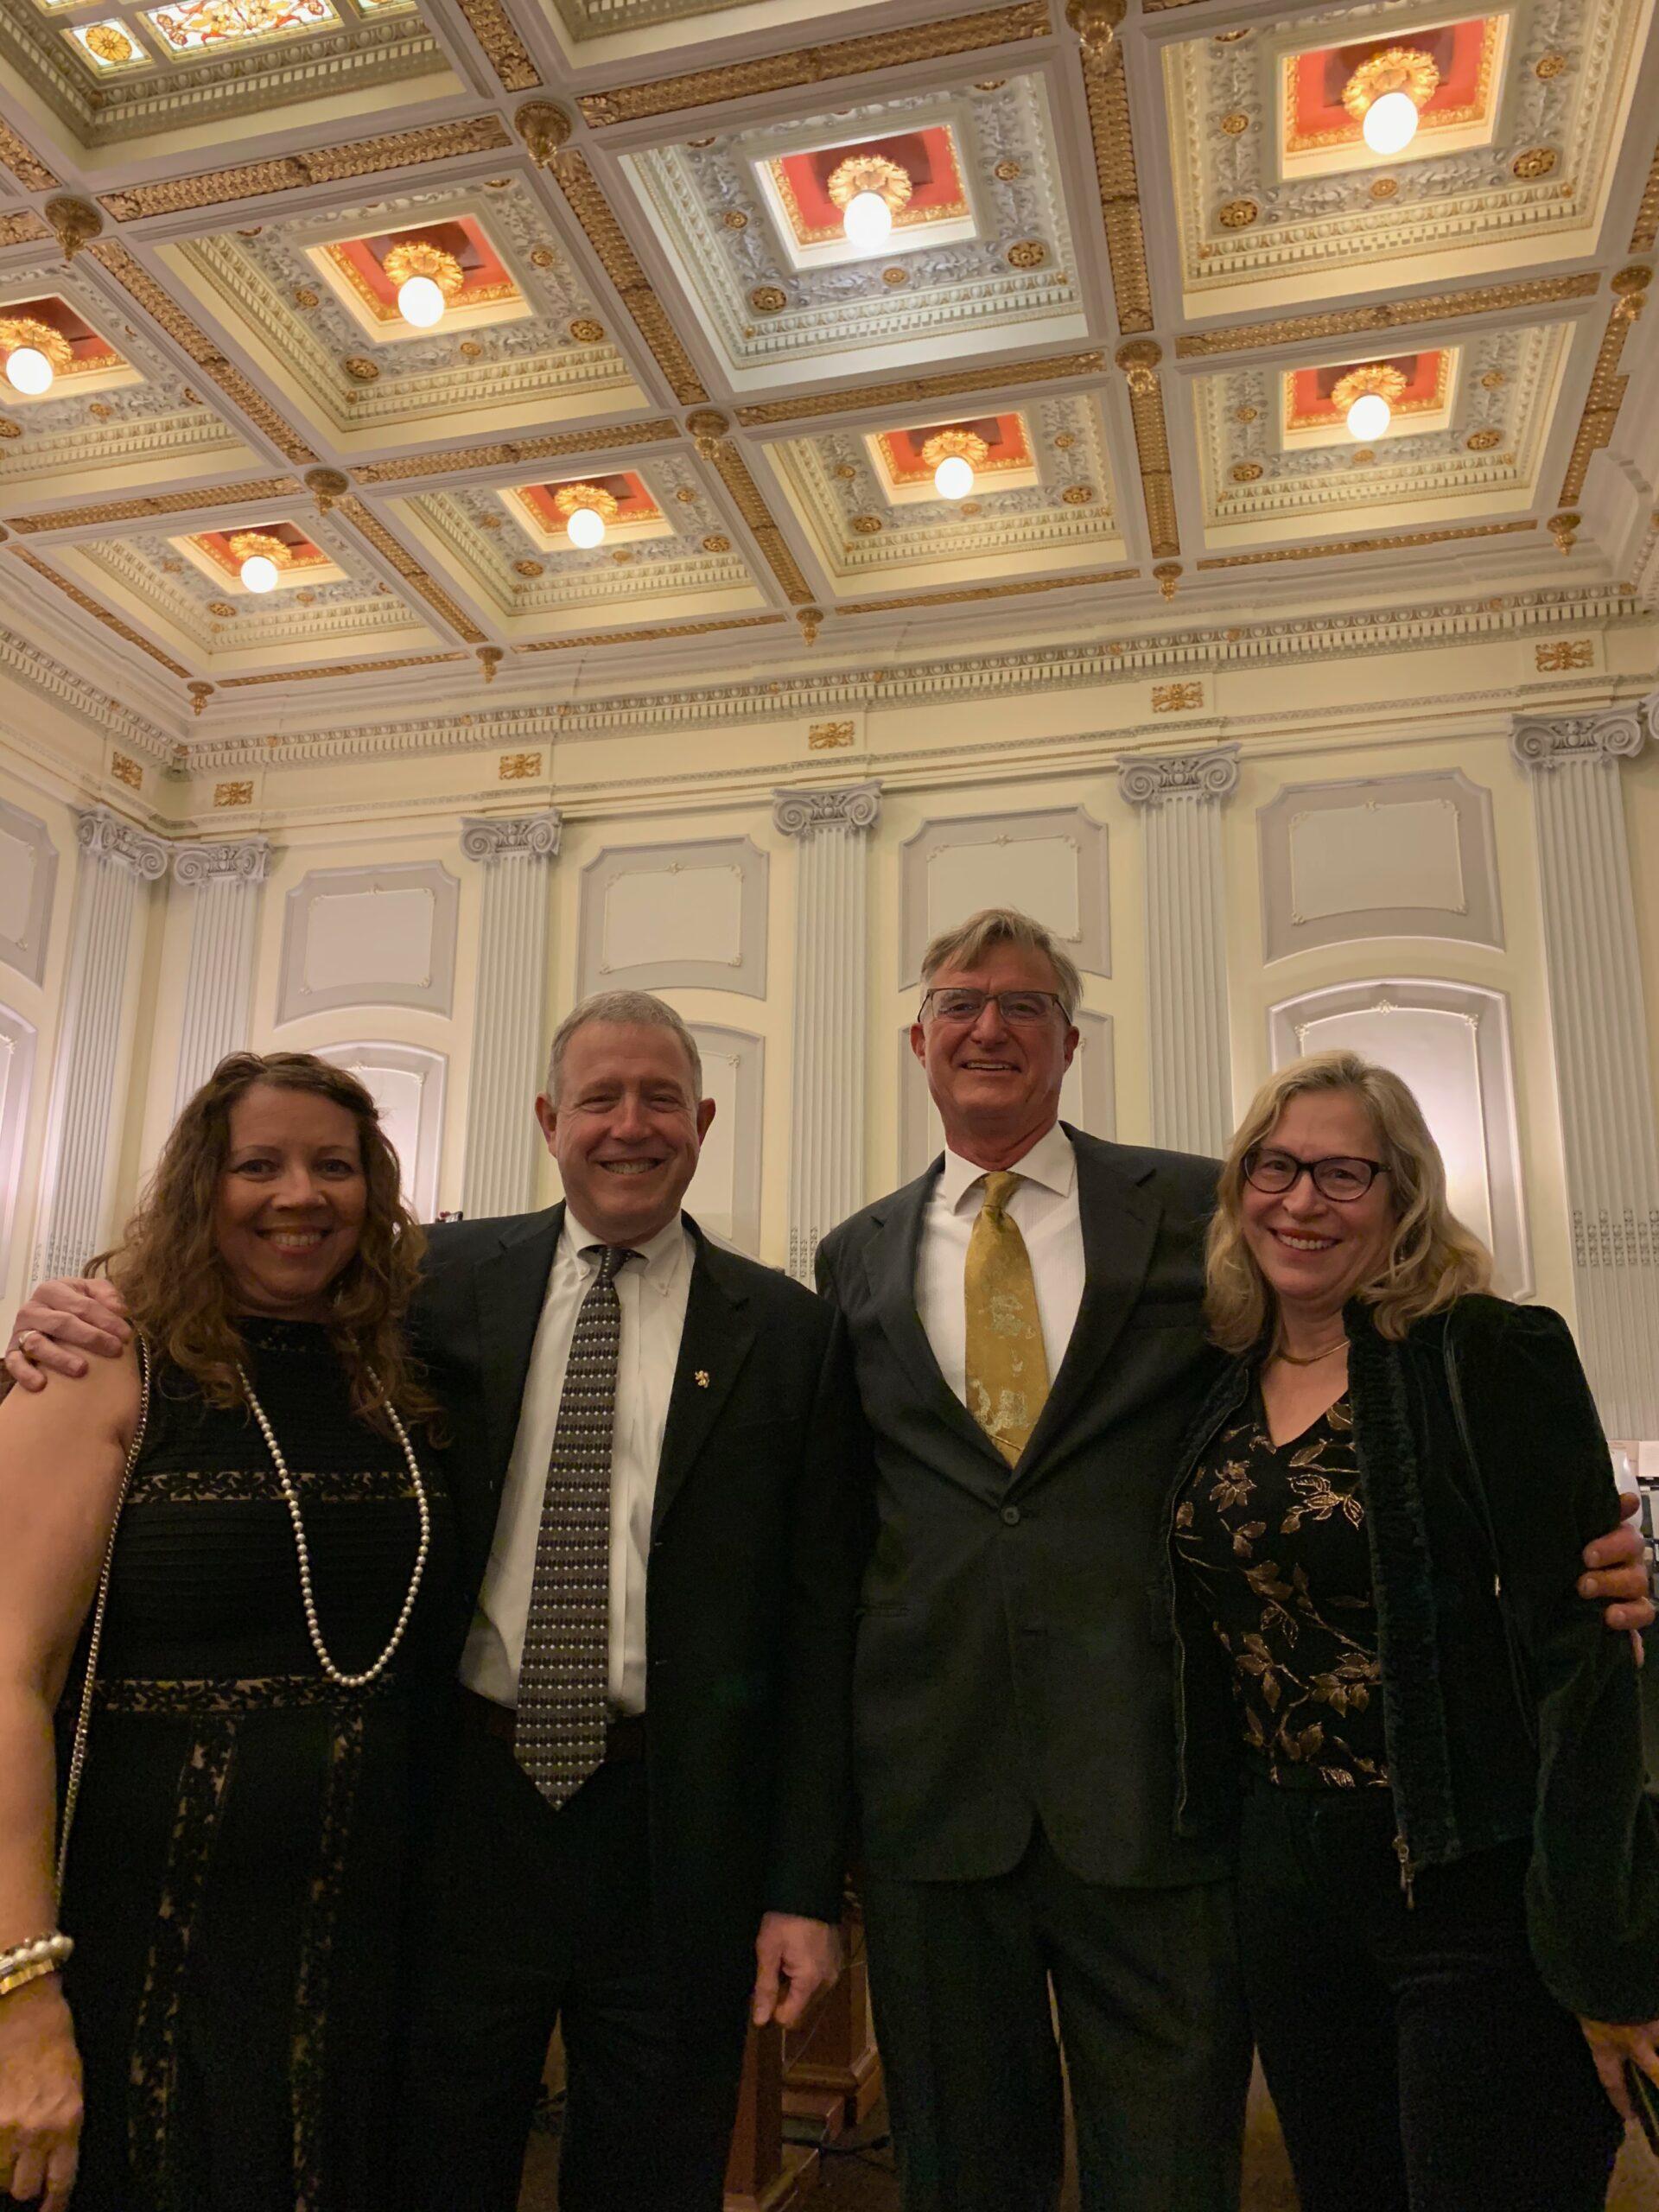 Molly Jahn, Bill Oemichen, Jahn Research Group